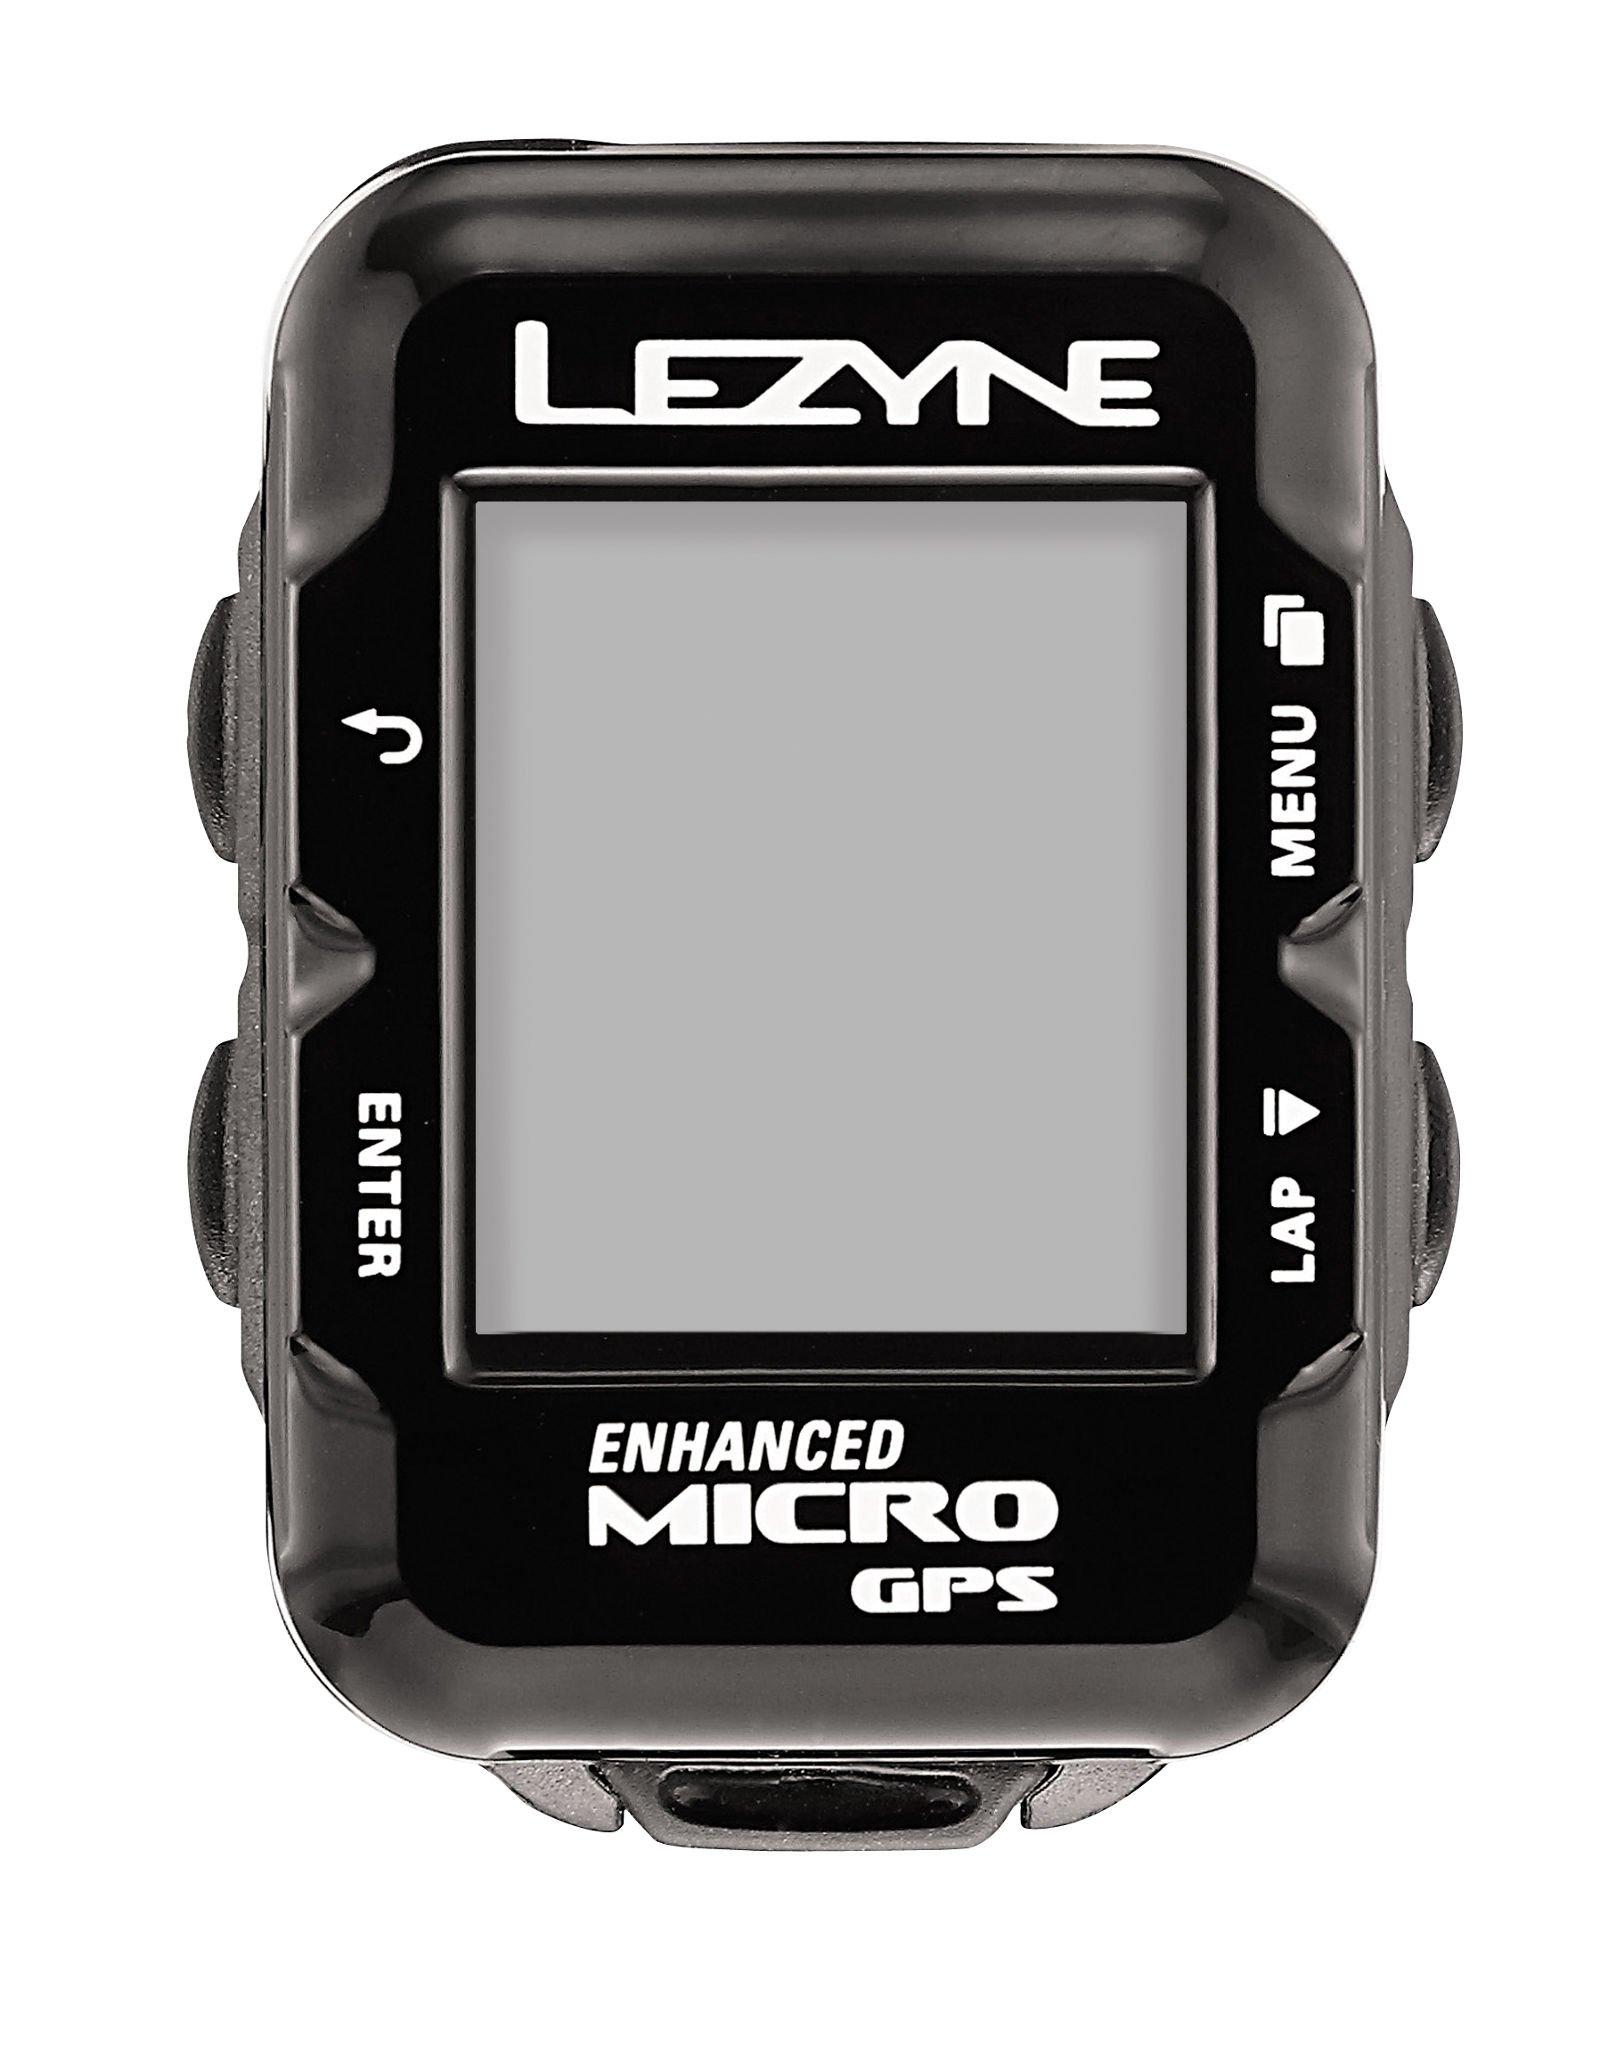 Lezyne Micro GPS, Black, One Size by Lezyne (Image #1)